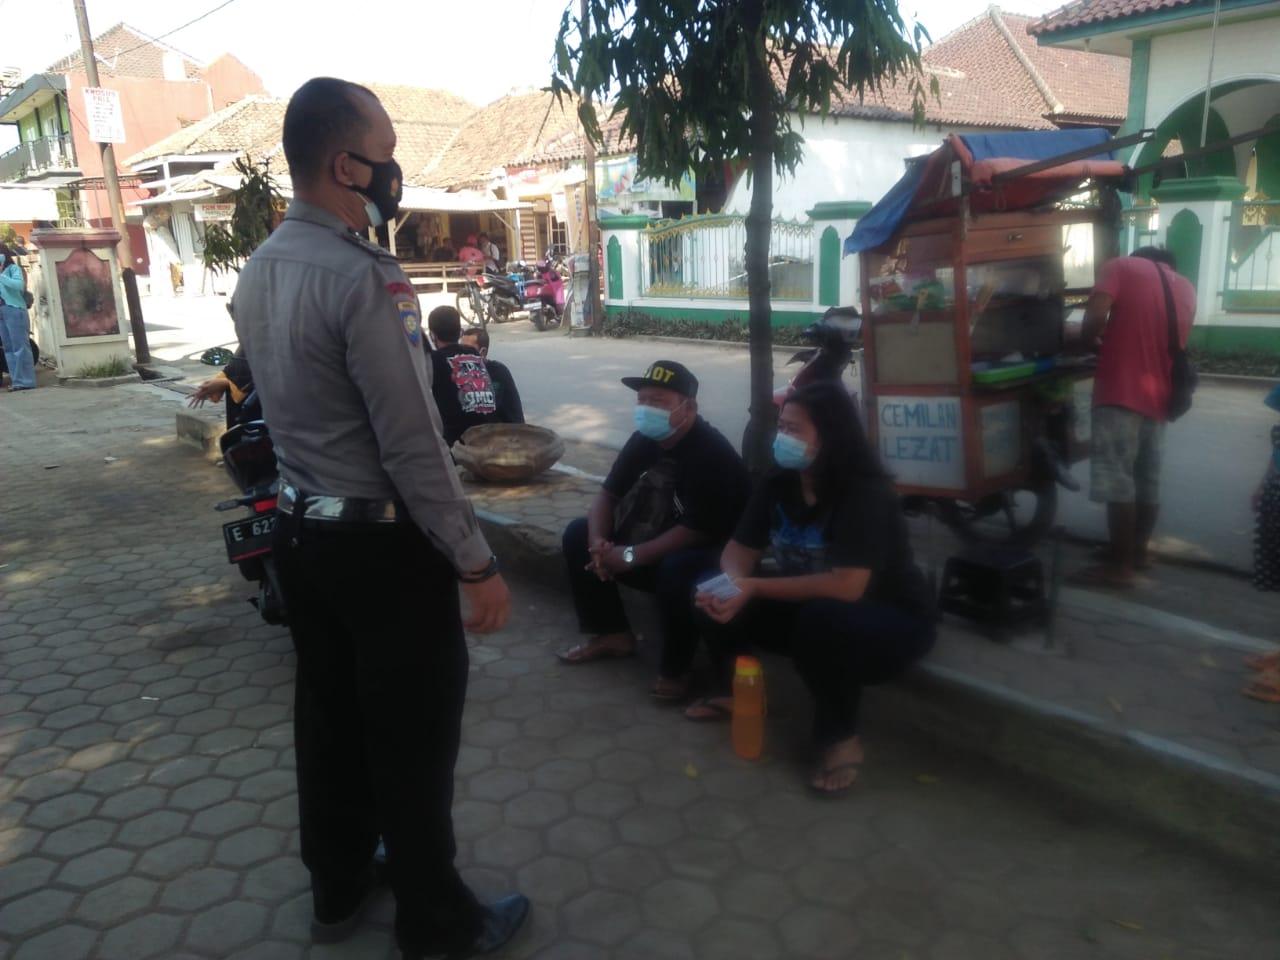 Patroli PPKM Mikro Polsek Kasokandel Menyampaikan Sosialiasi Penerapan PPKM Mikro Darurat Level 4 Jawa Barat